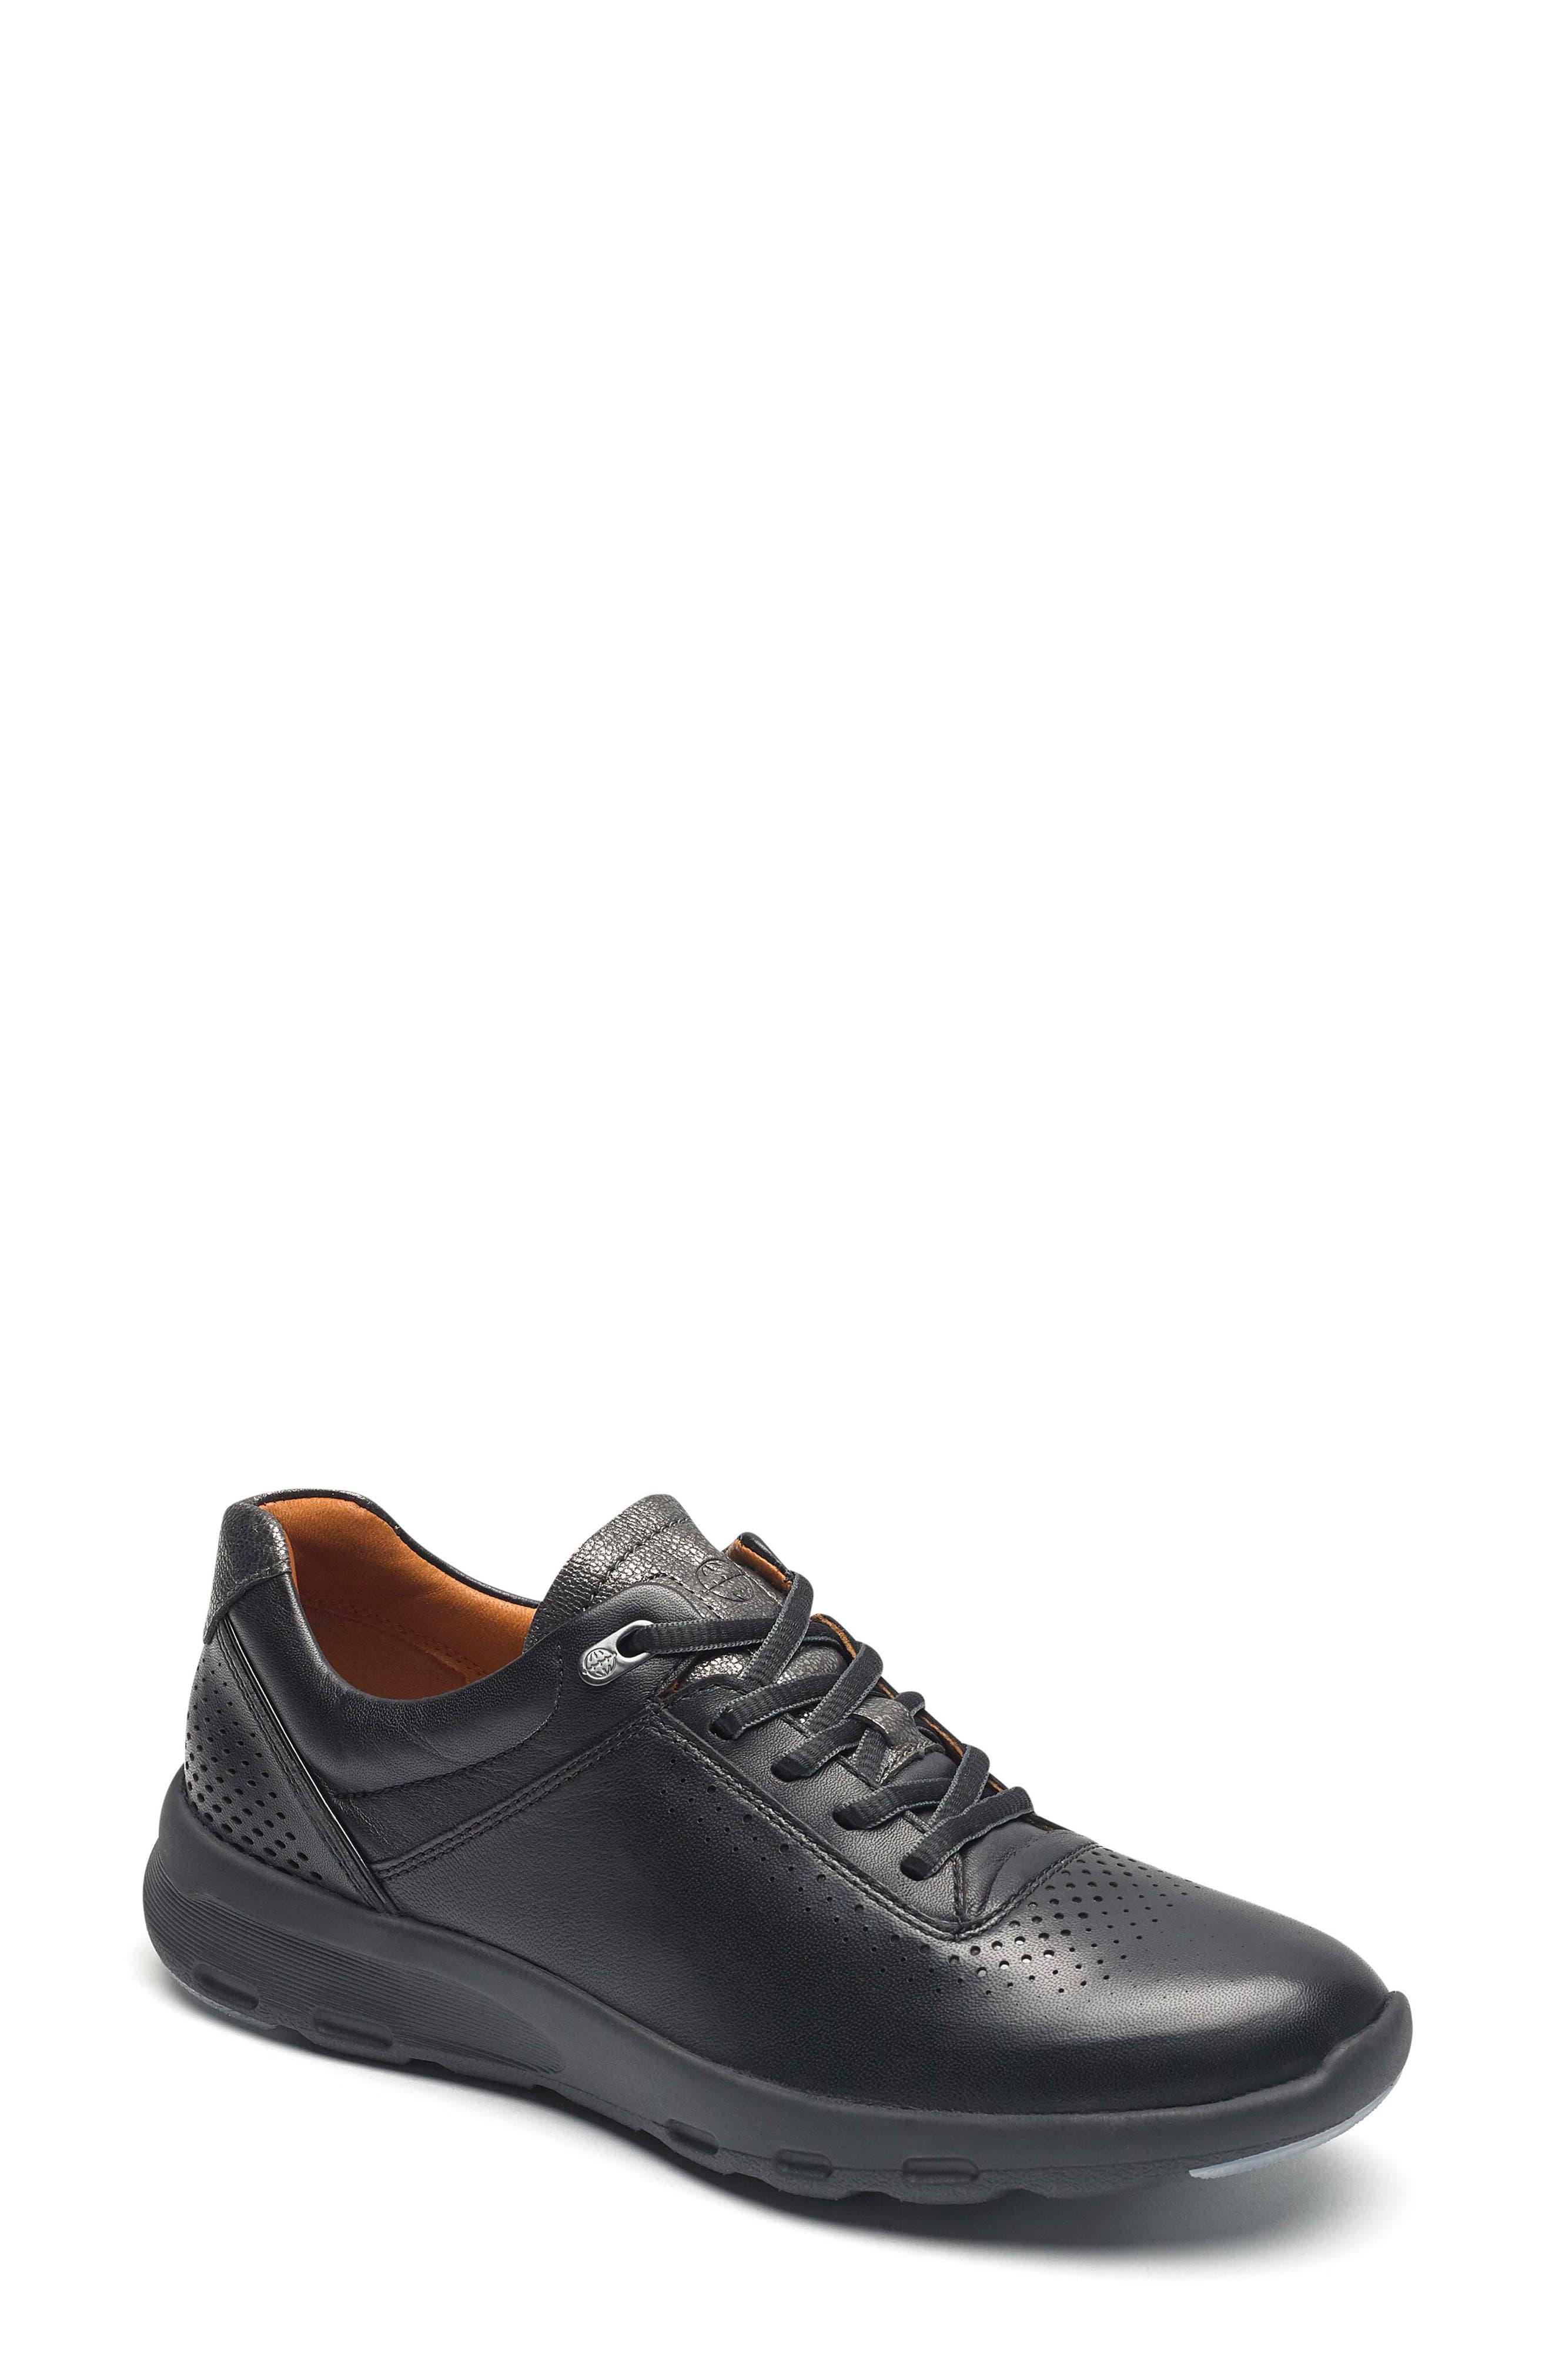 ROCKPORT,                             Let's Walk<sup>®</sup> Ubal Sneaker,                             Main thumbnail 1, color,                             BLACK/ BLACK LEATHER